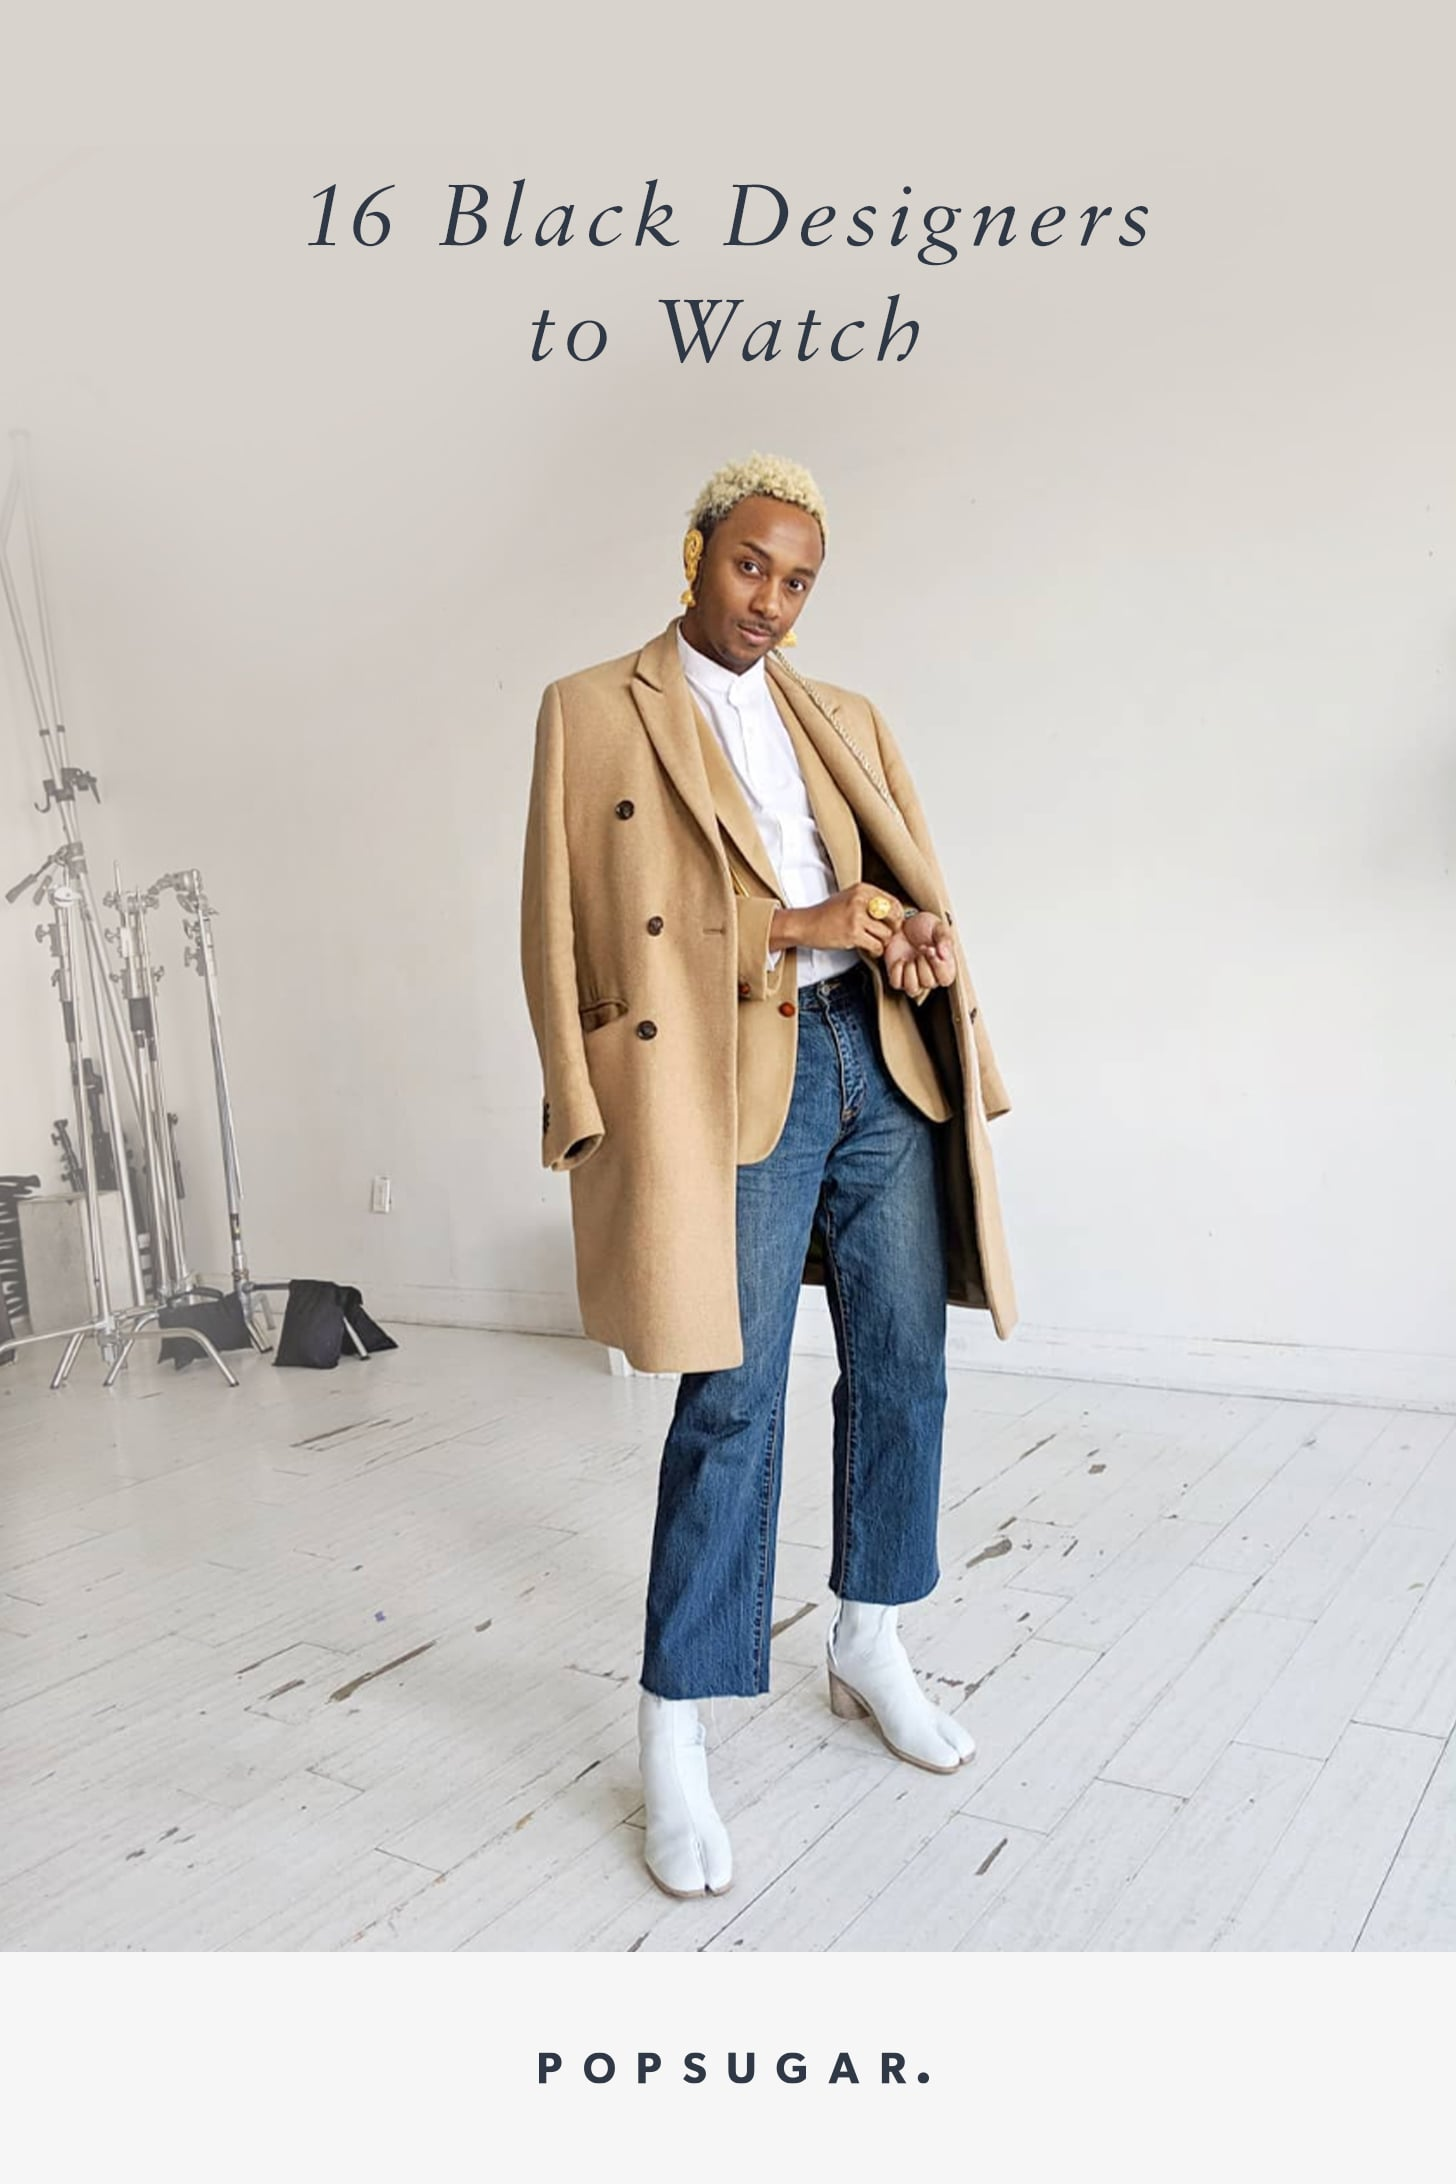 Black Fashion Designers 2019 Popsugar Fashion